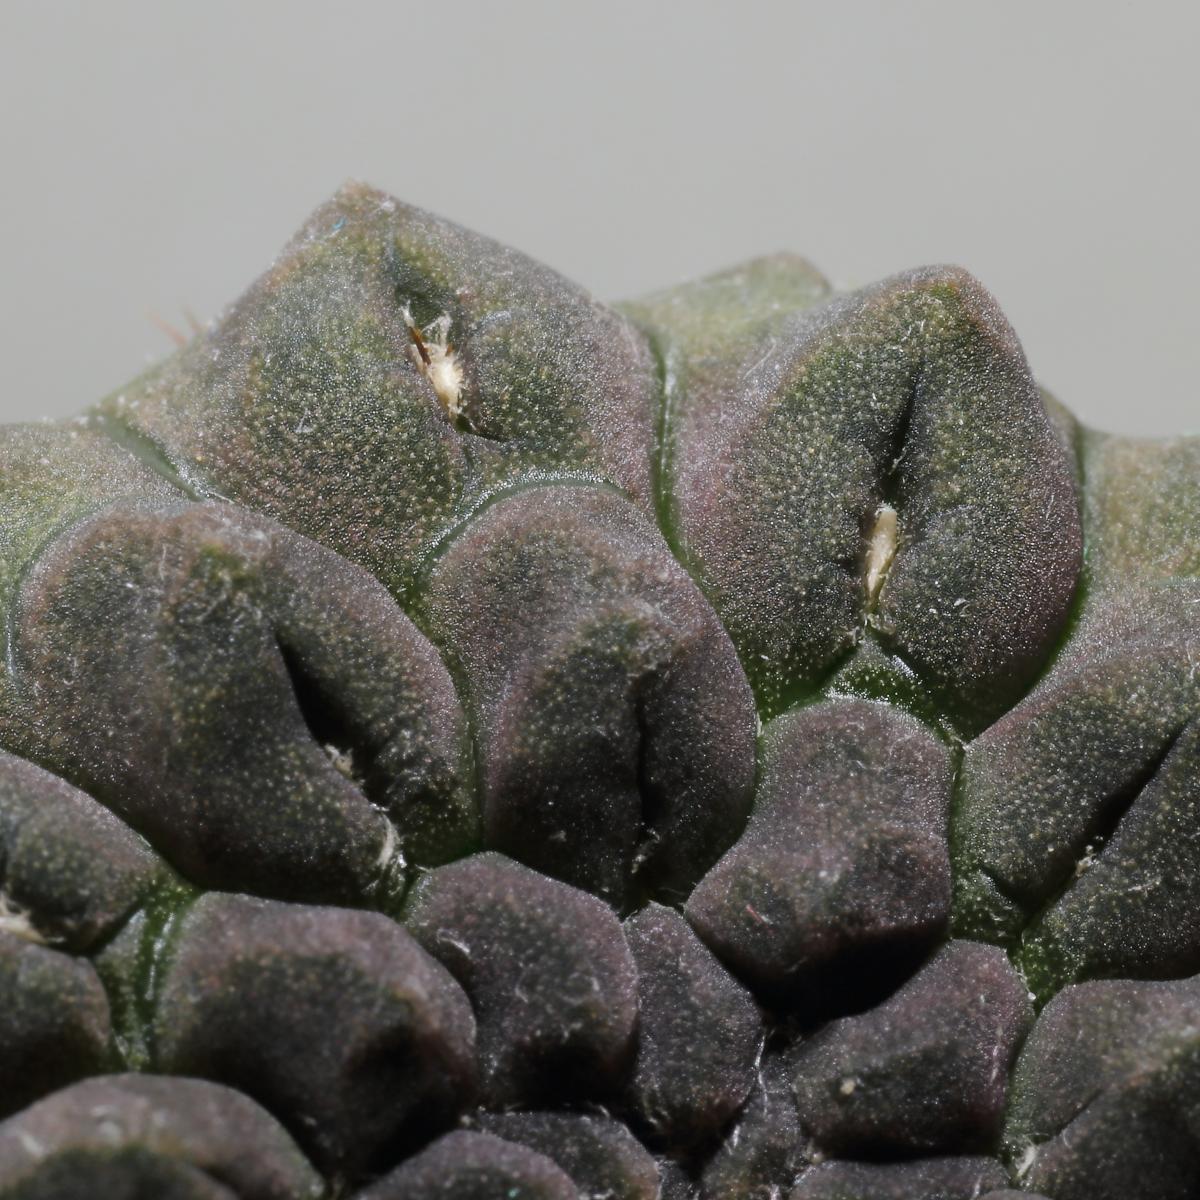 El Eriosyce occulta es un cactus pequeño